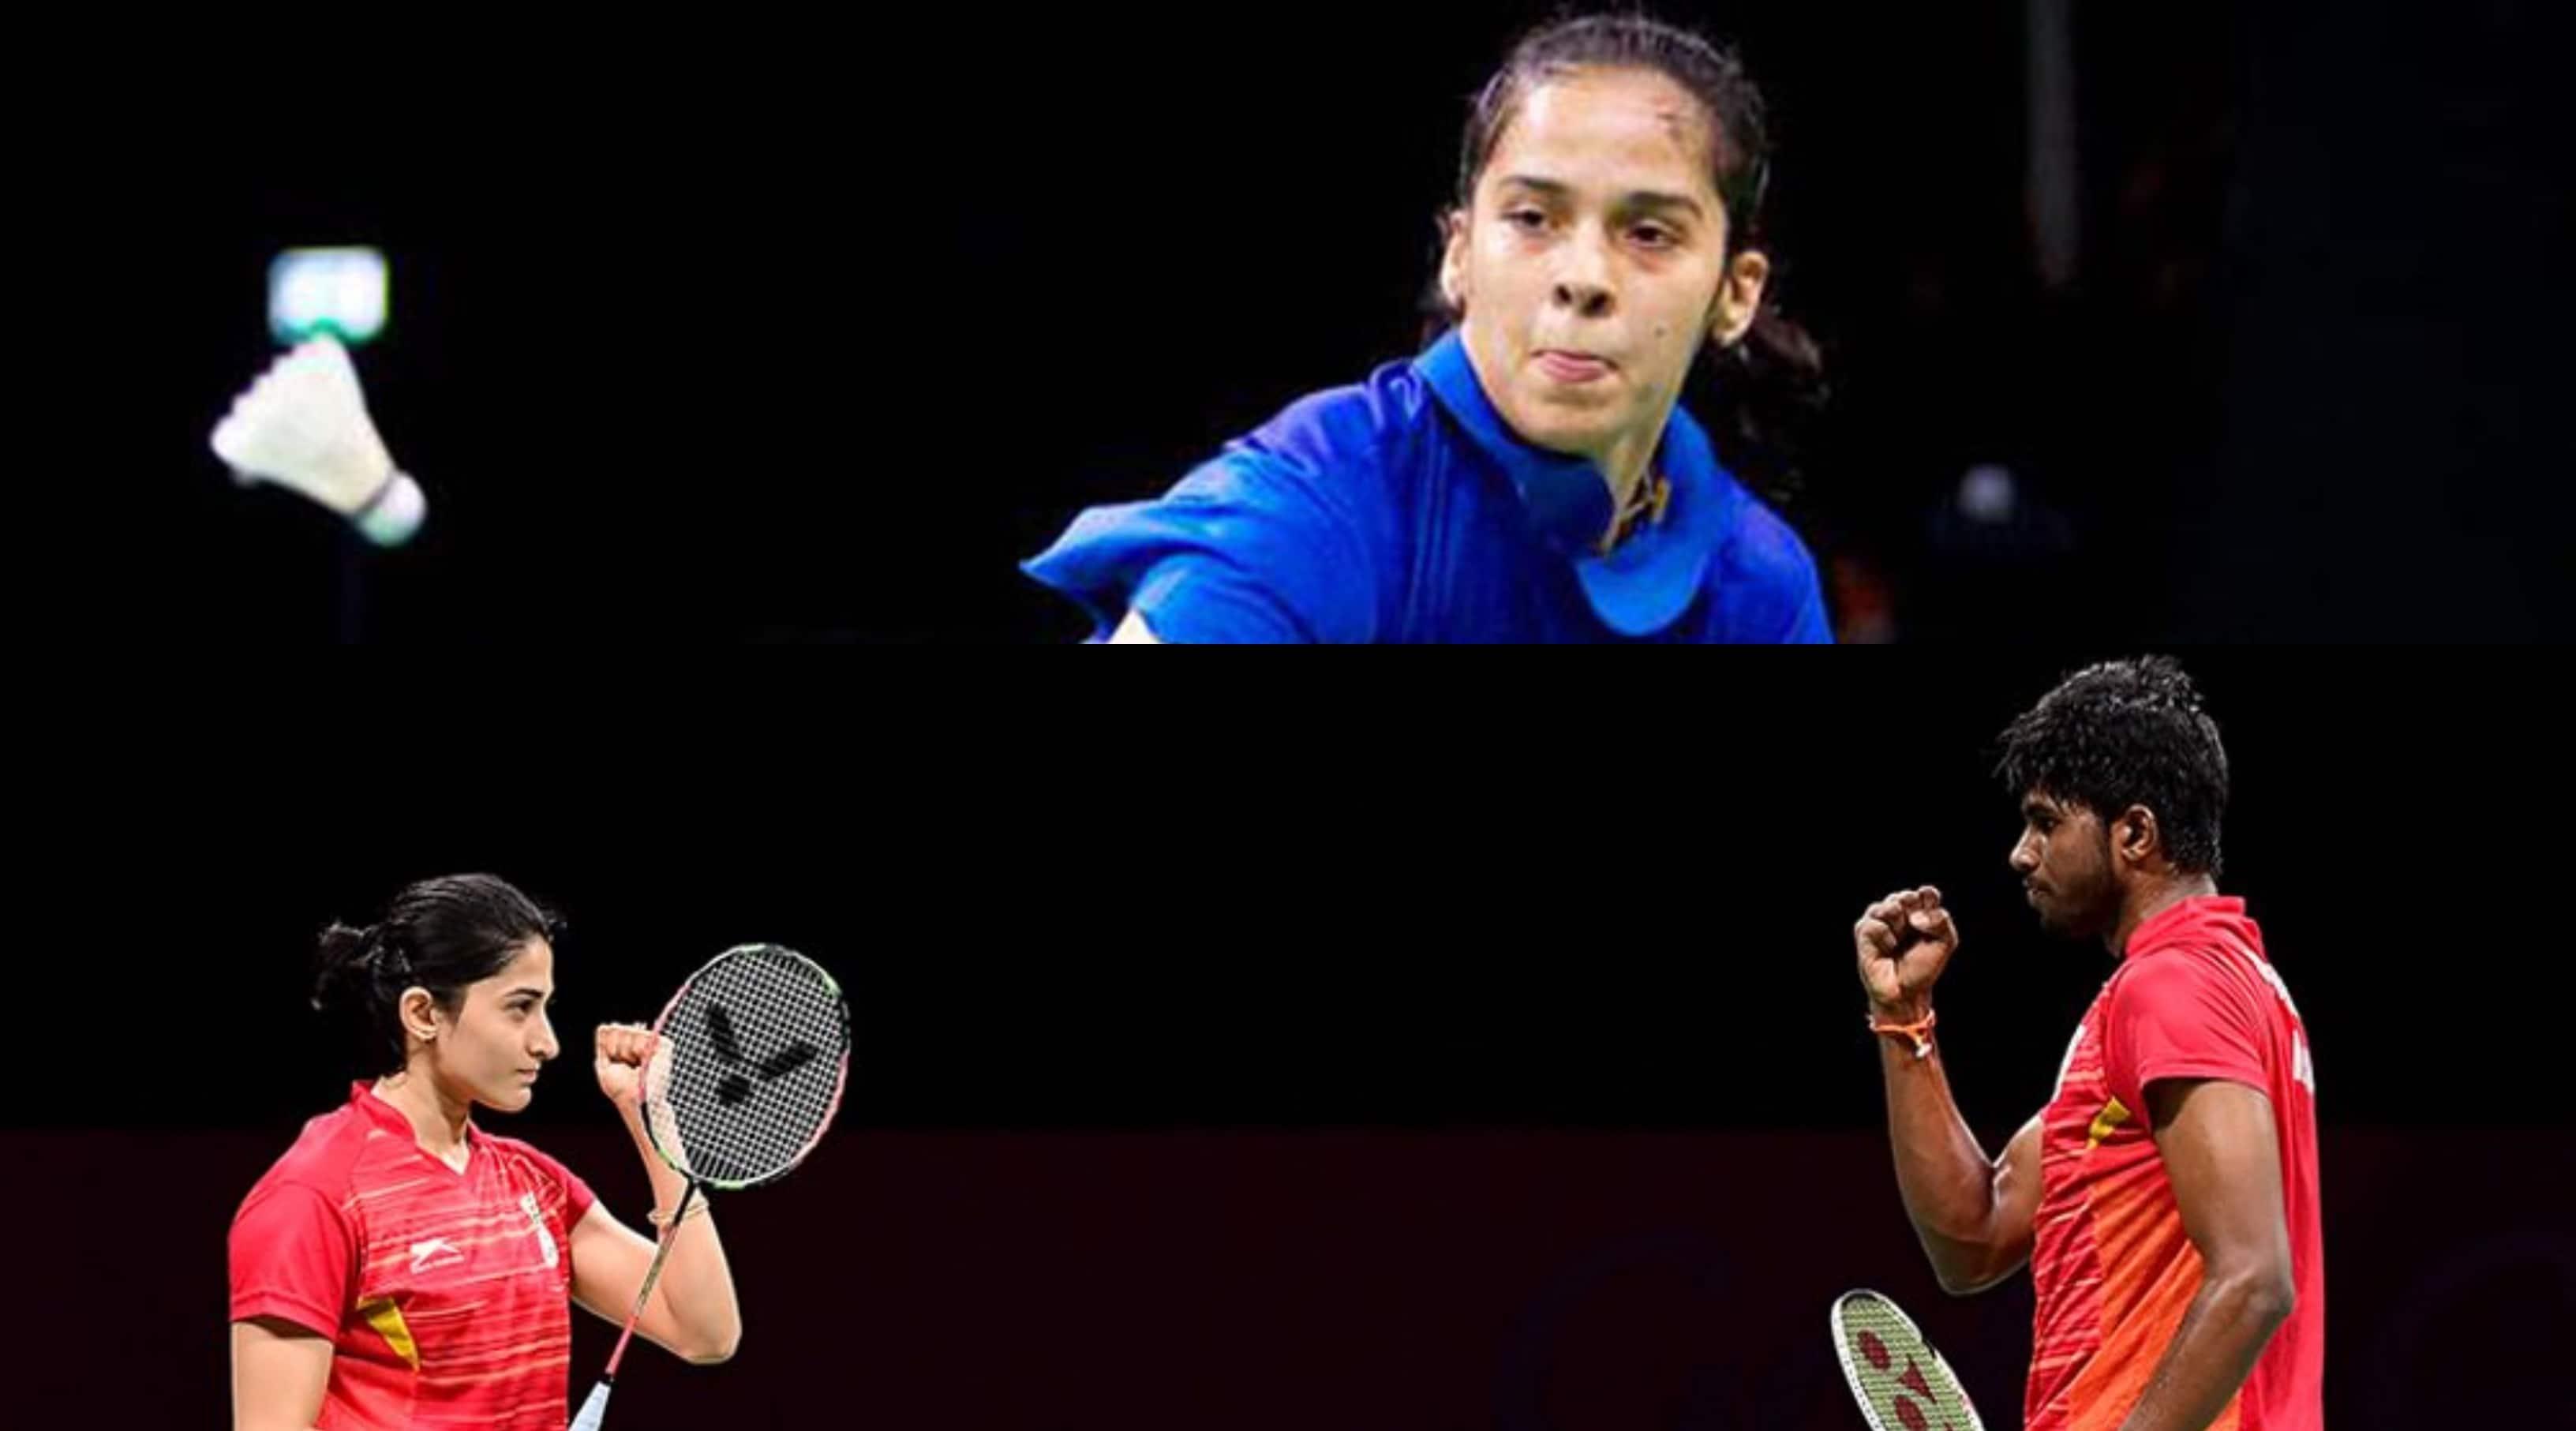 Saina Nehwal, Satwiksairaj Rankireddy, Ashwini Ponnappa enter Badminton World Championships quarterfinals